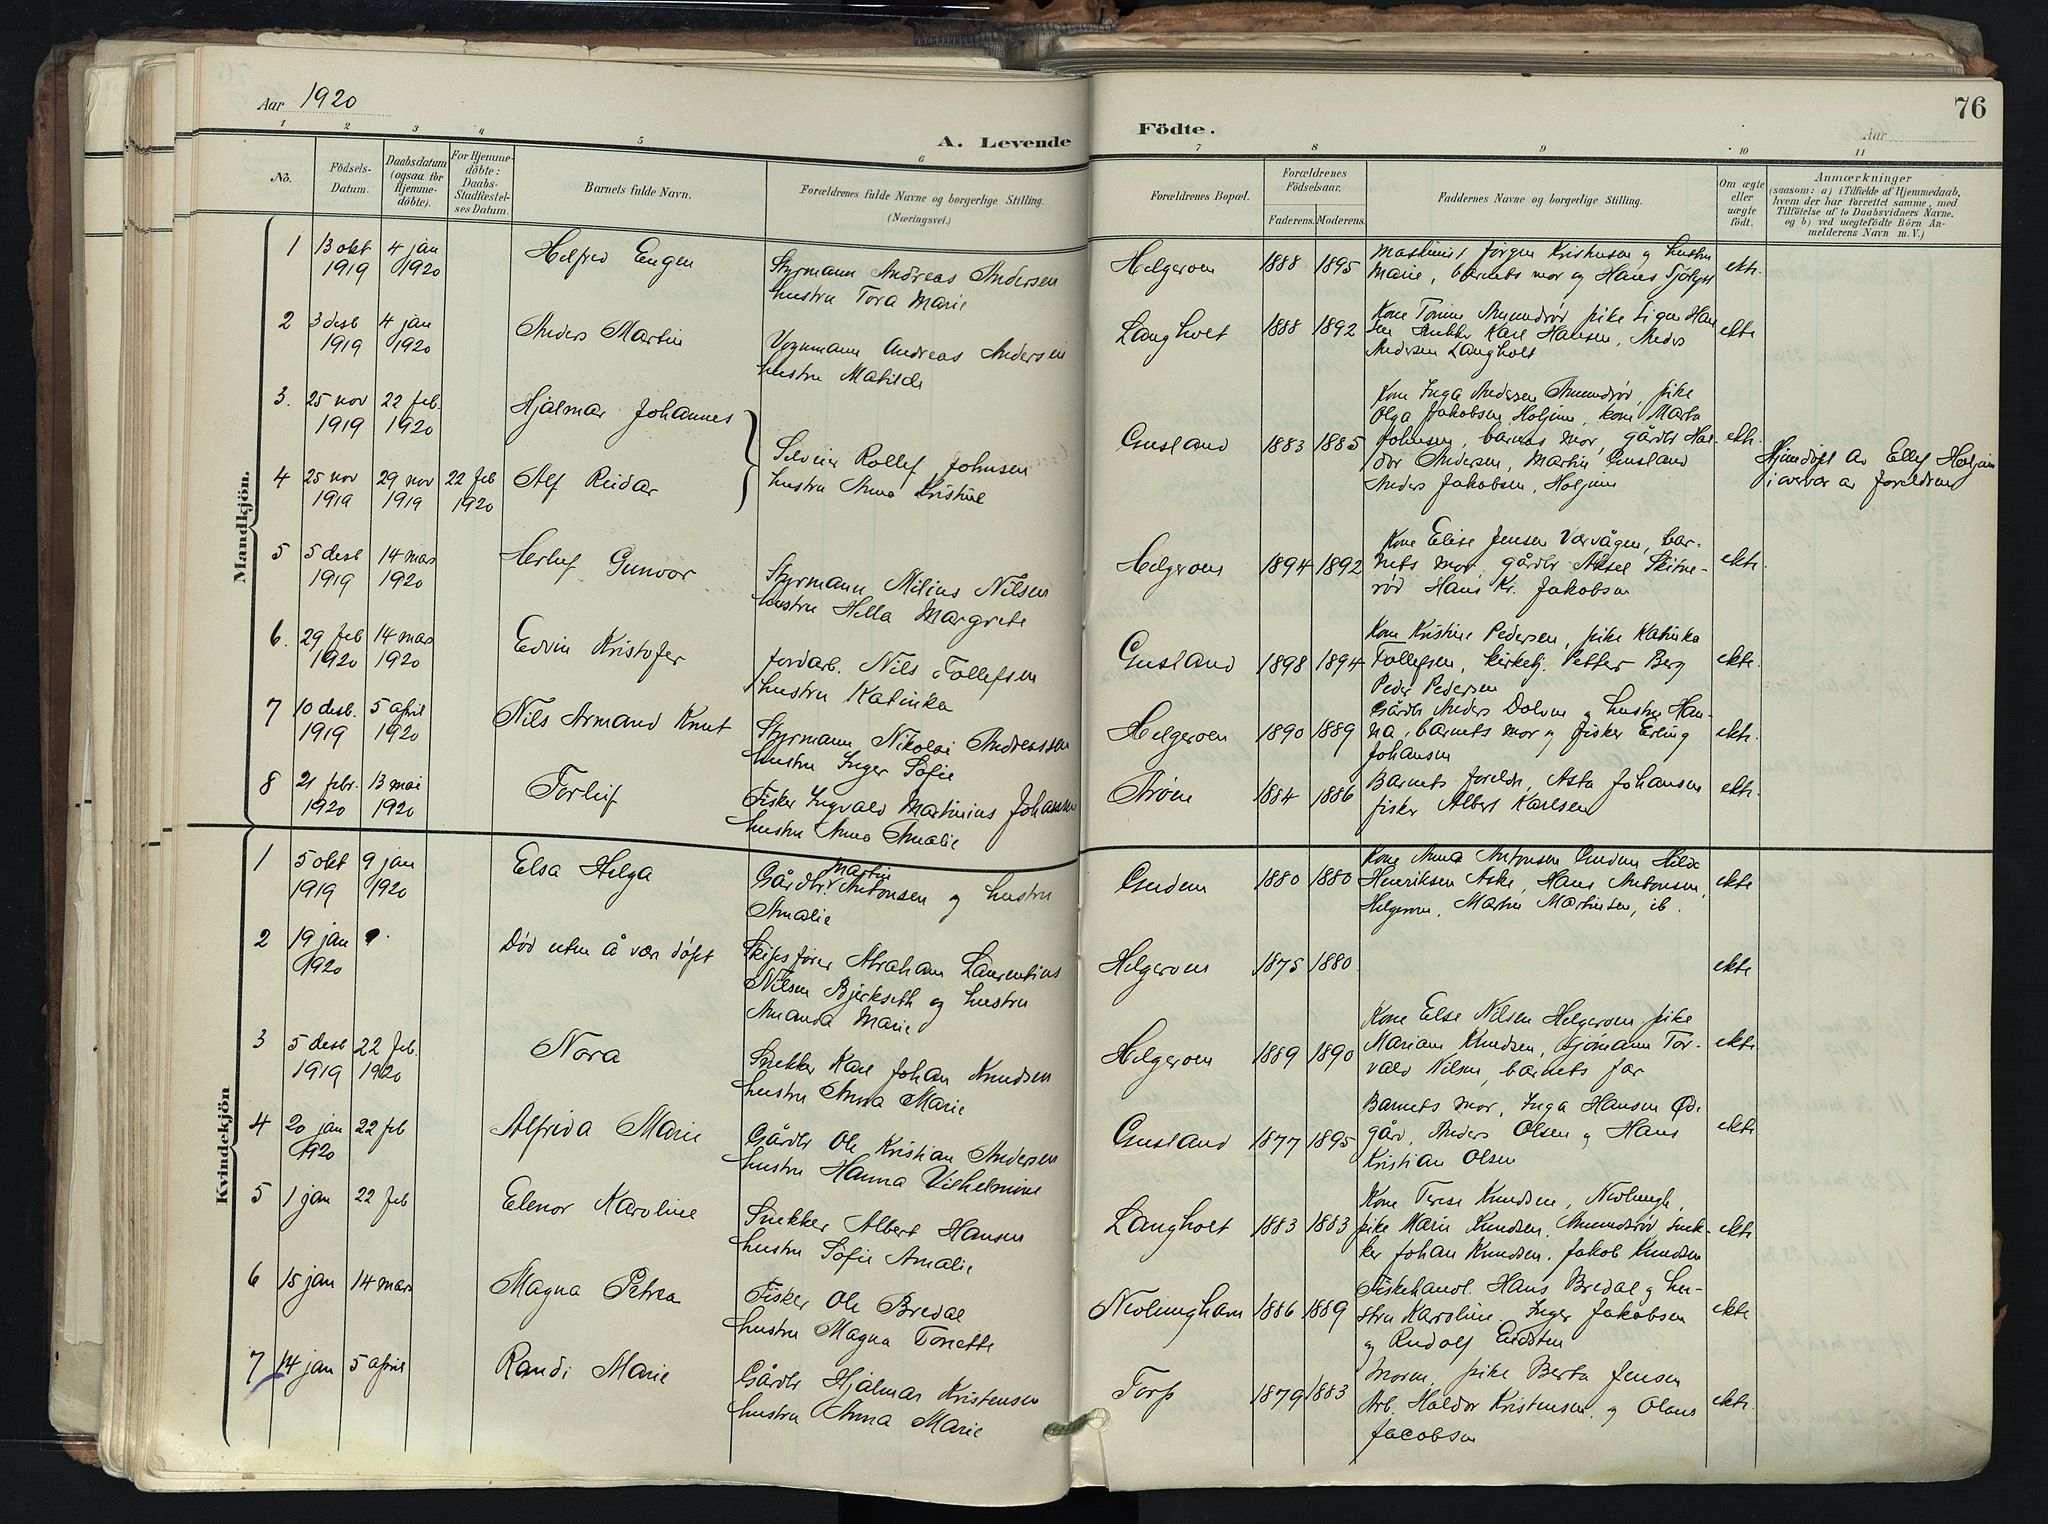 SAKO, Brunlanes kirkebøker, F/Fb/L0003: Ministerialbok nr. II 3, 1900-1922, s. 76